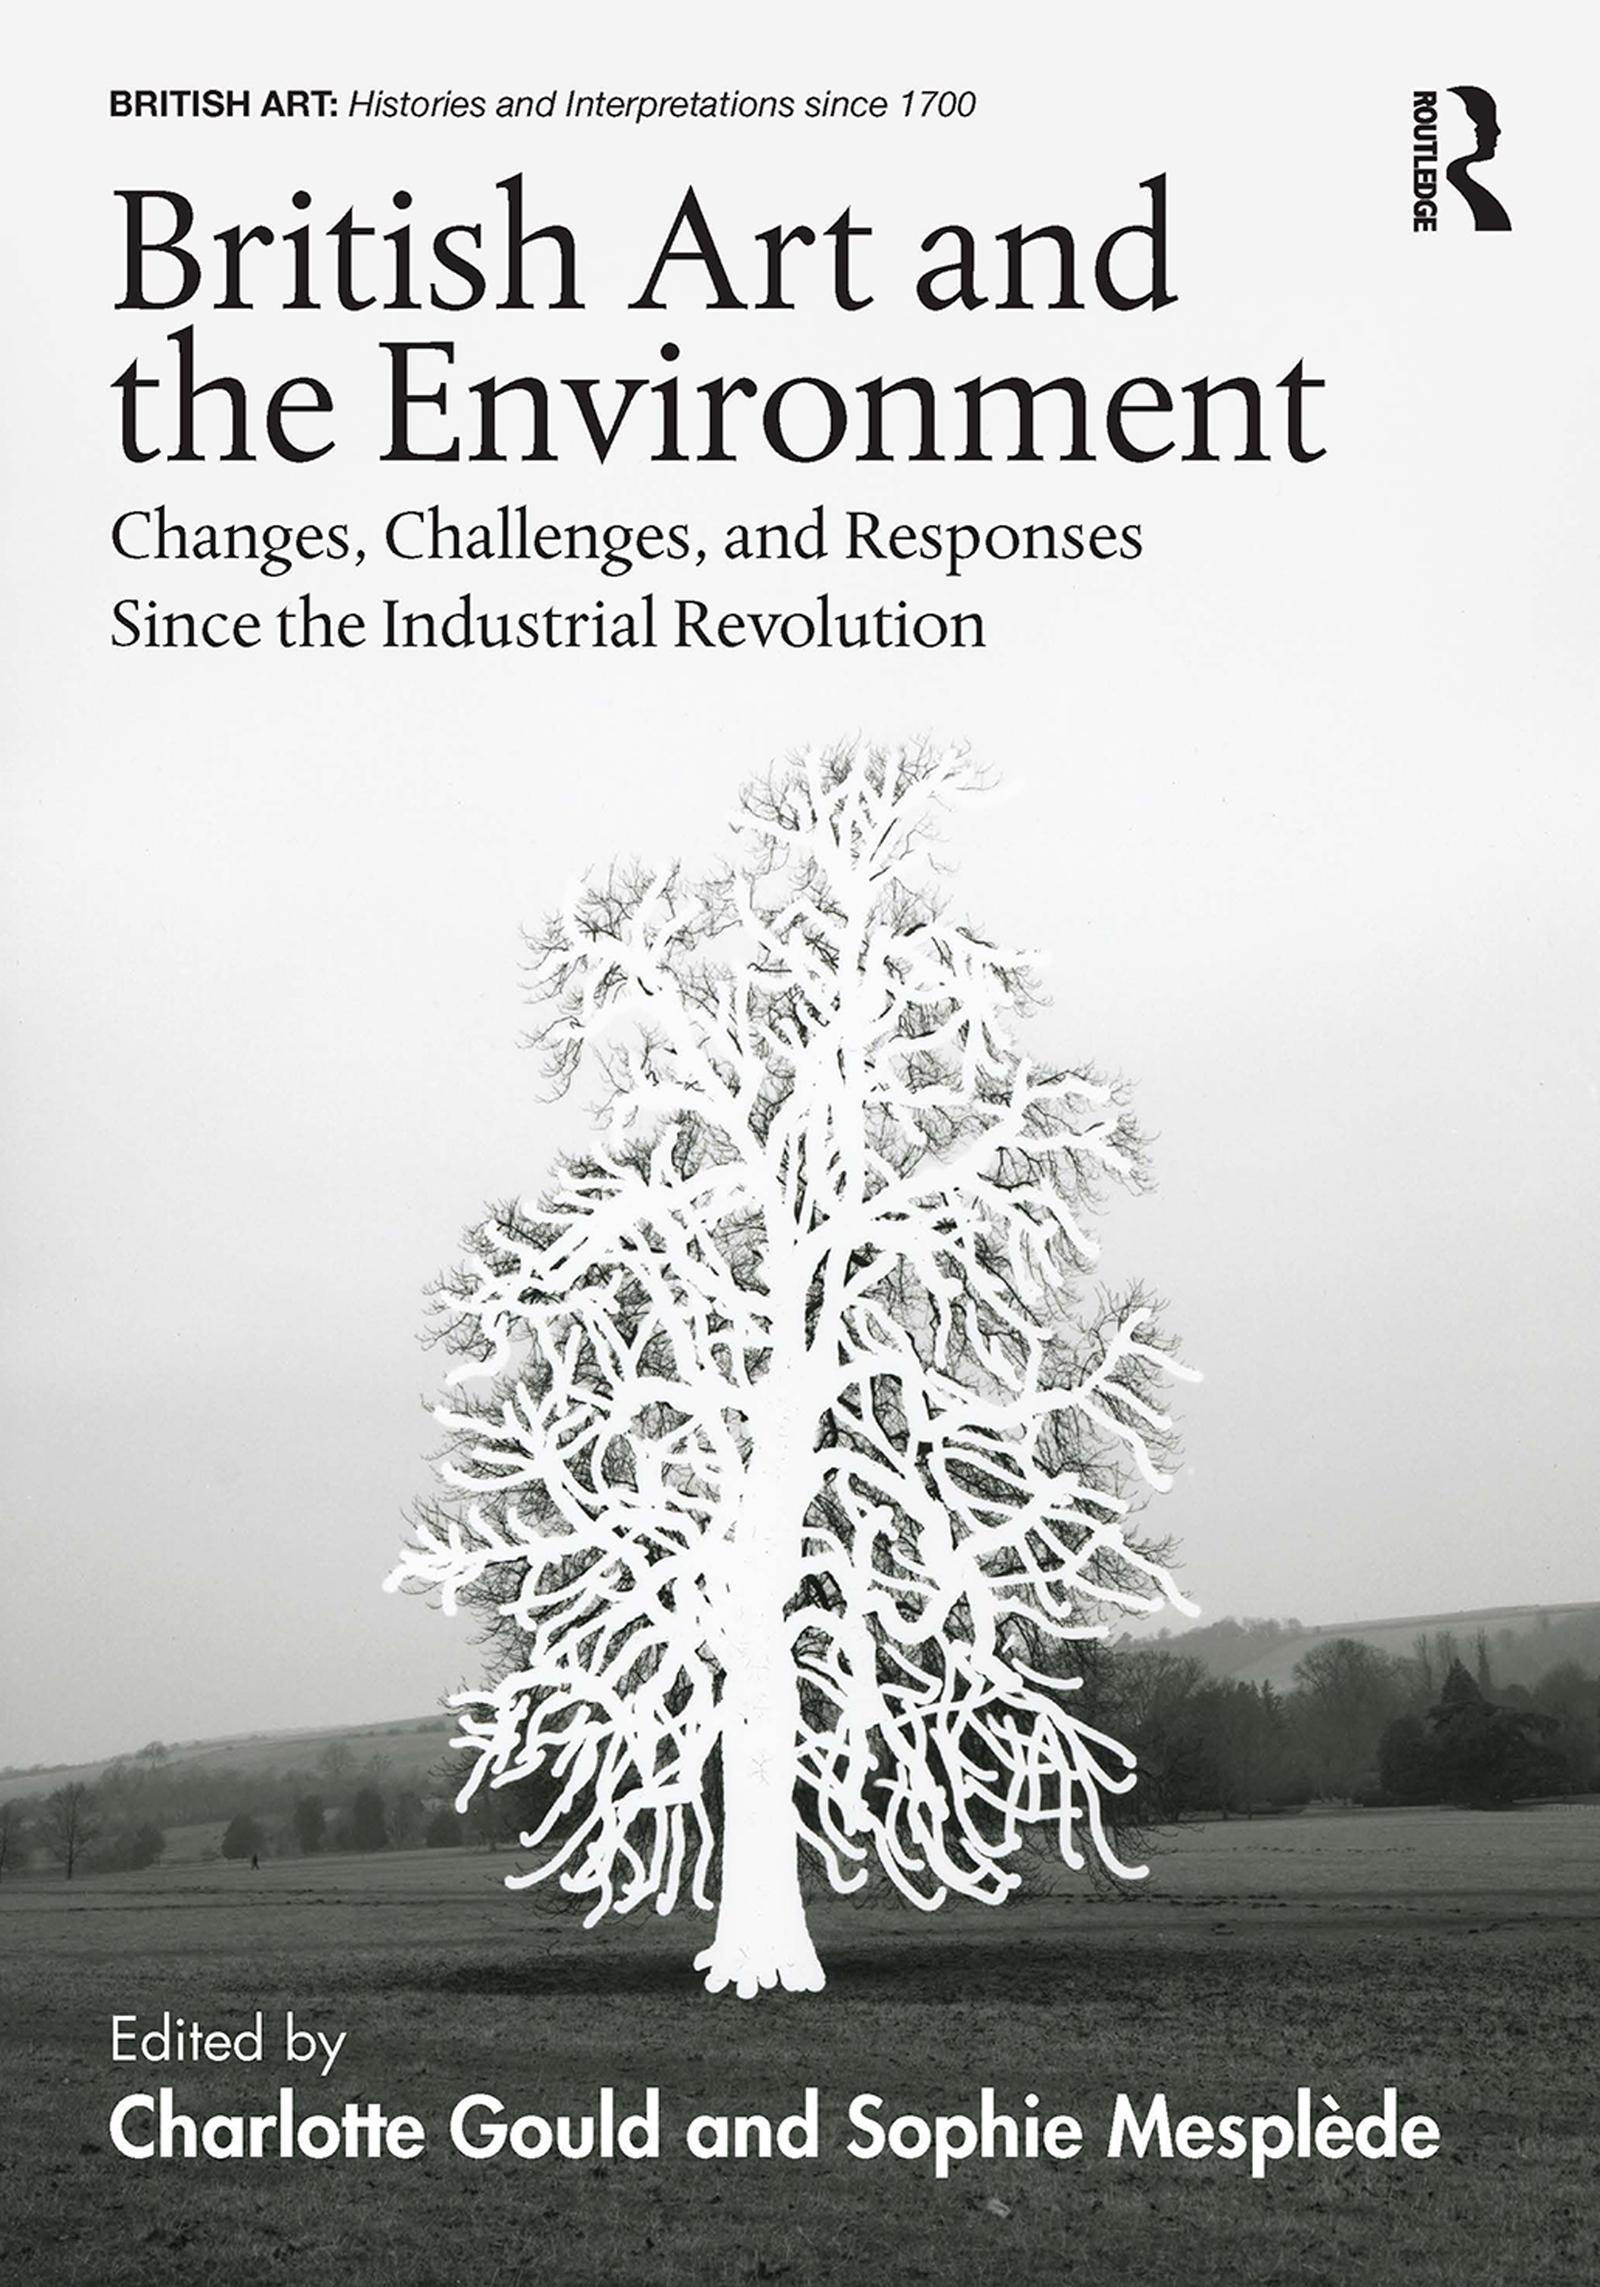 British Art and the Environment